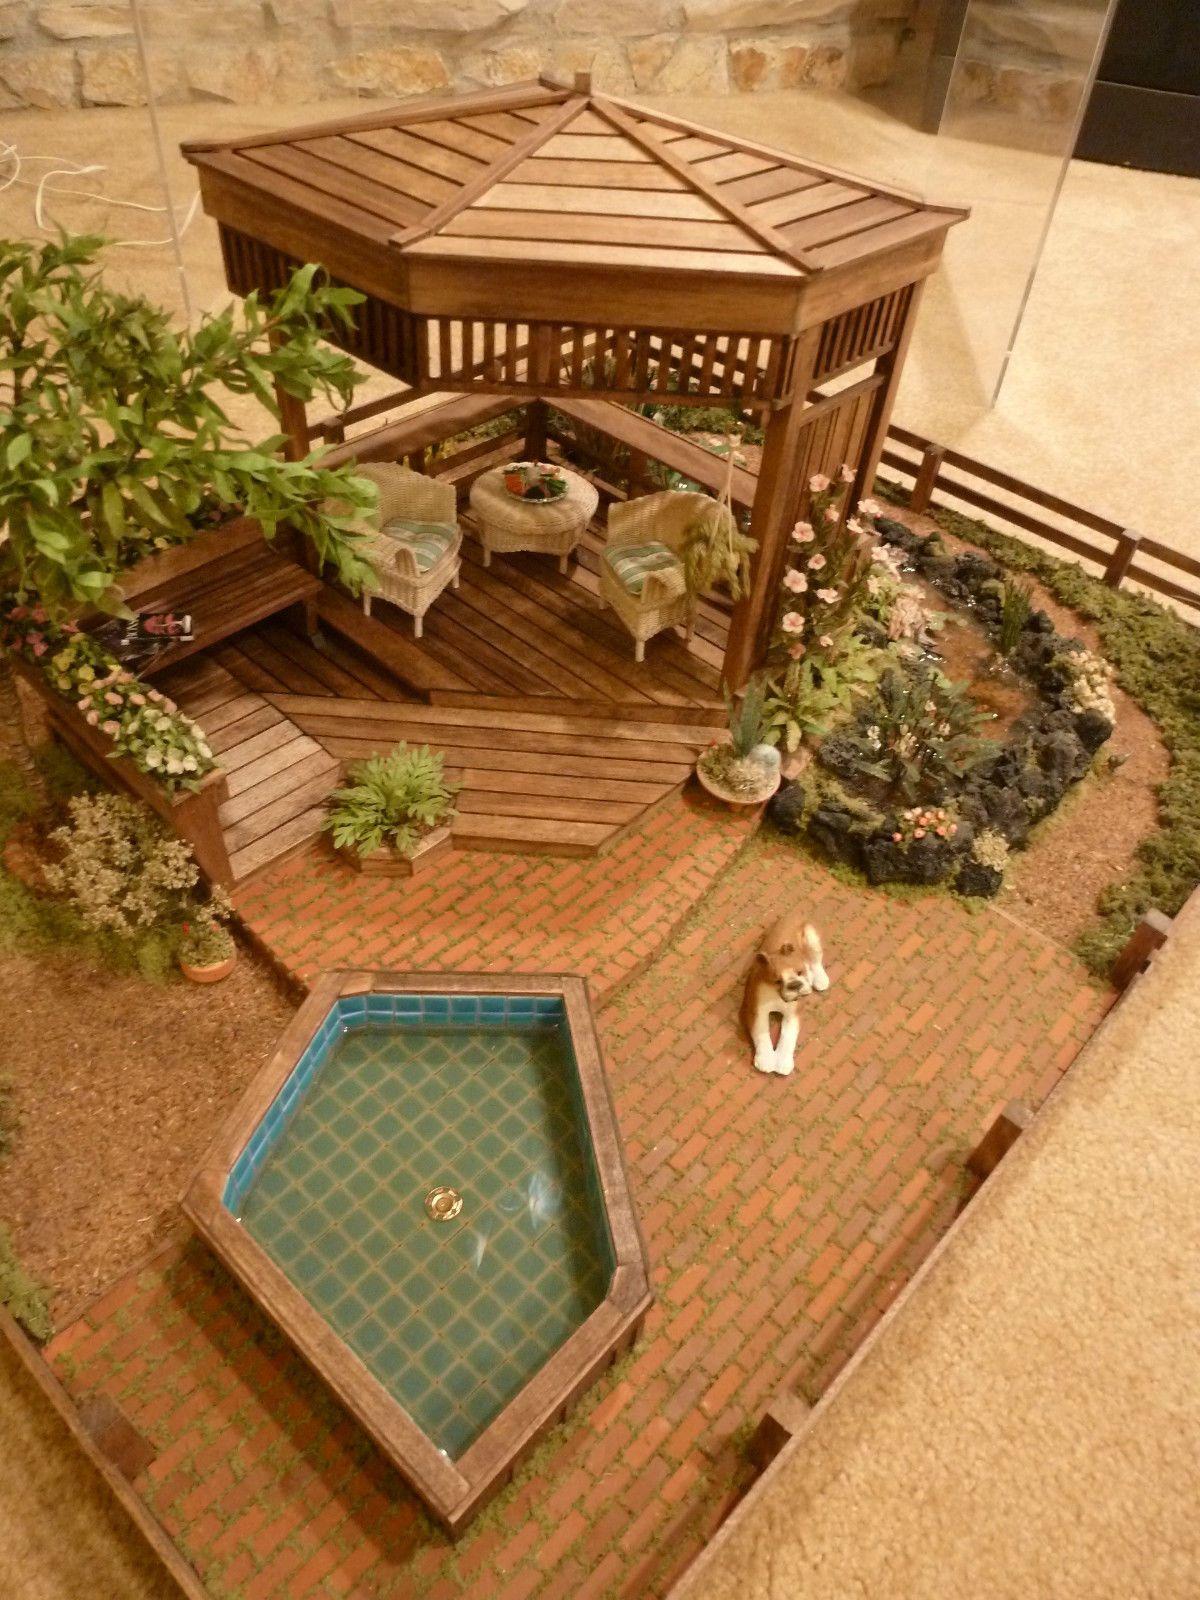 Beautiful miniature garden display gazebo, jacuzzi, flowers, trees ...